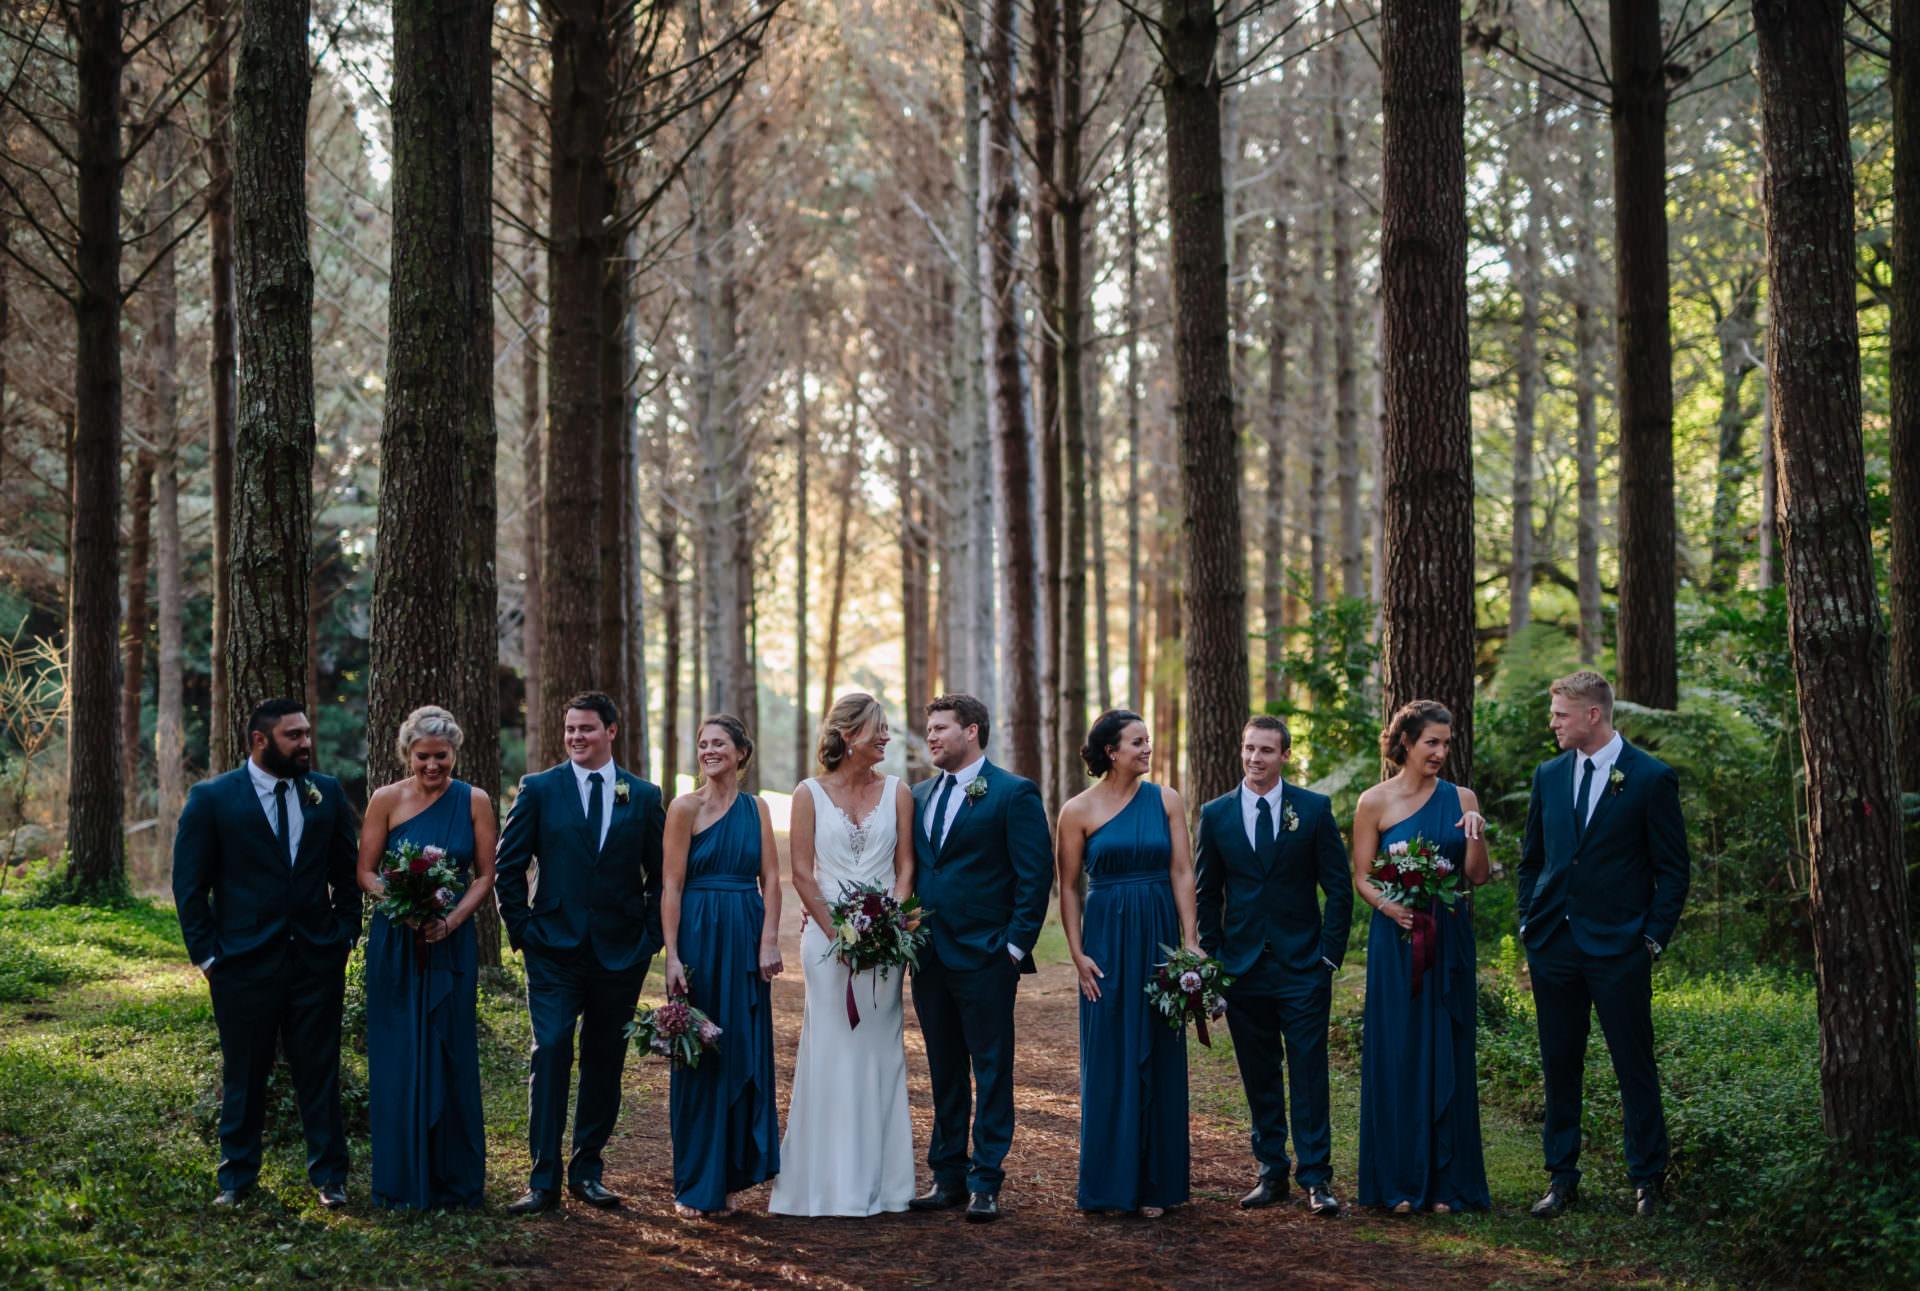 wedding chair hire hamilton nz folding bunnings jo 43 mike hunua falls camp auckland weddings  the